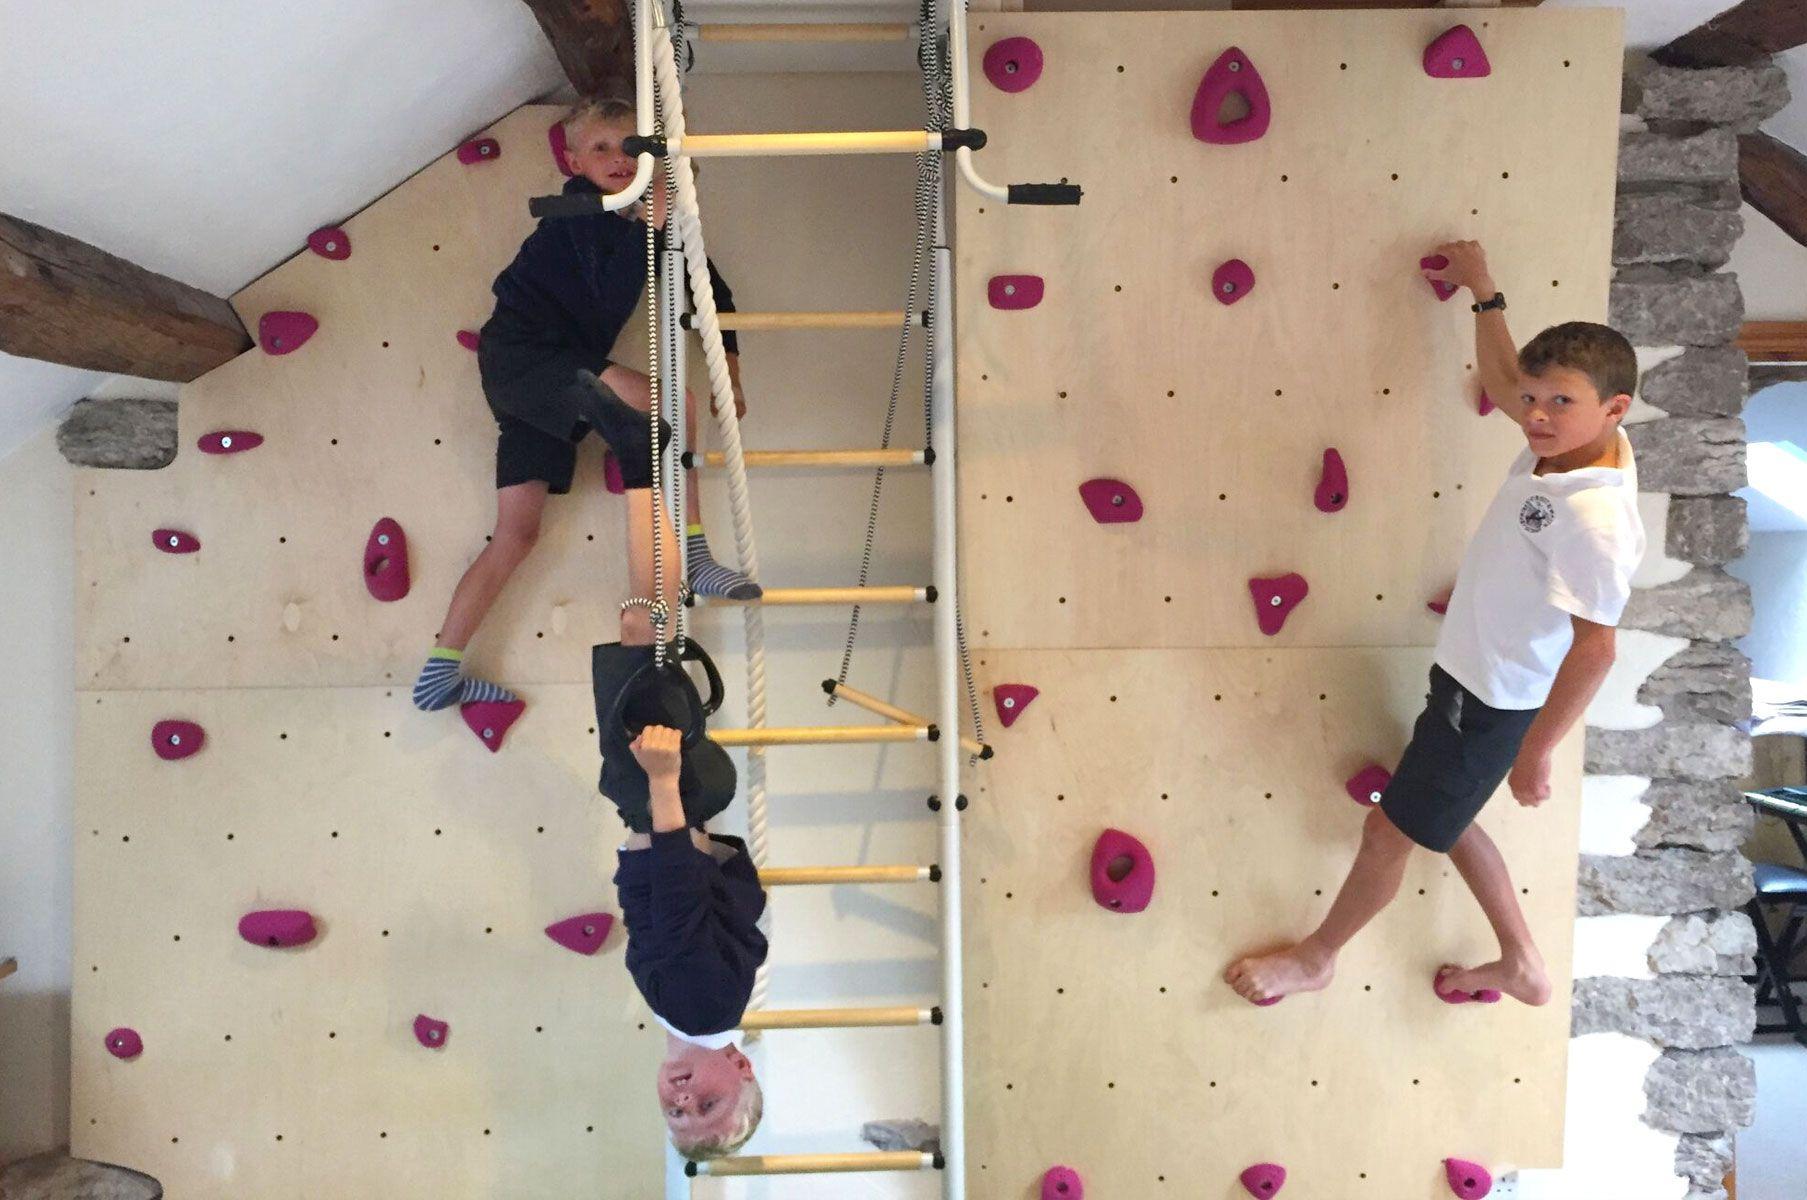 Boys climbing bedroom wall best homemade dog food